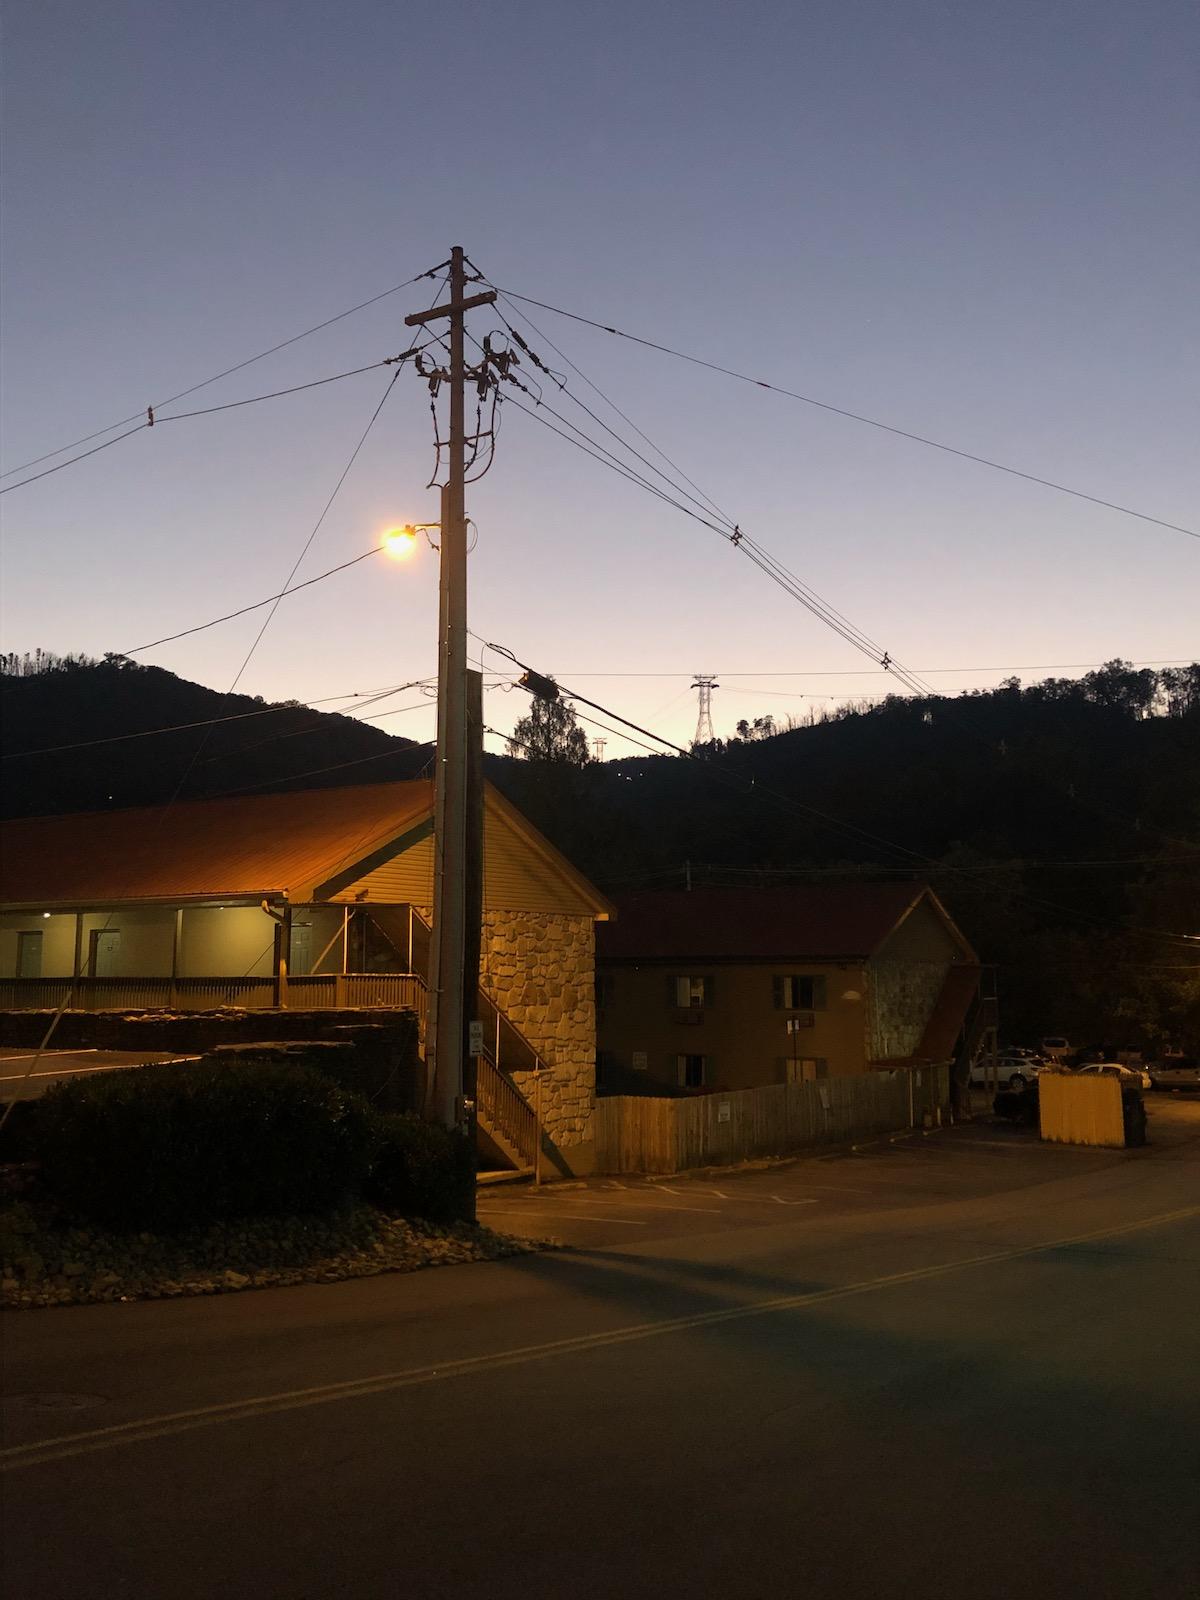 Empty, street, dimly lit houses, electrical pole.